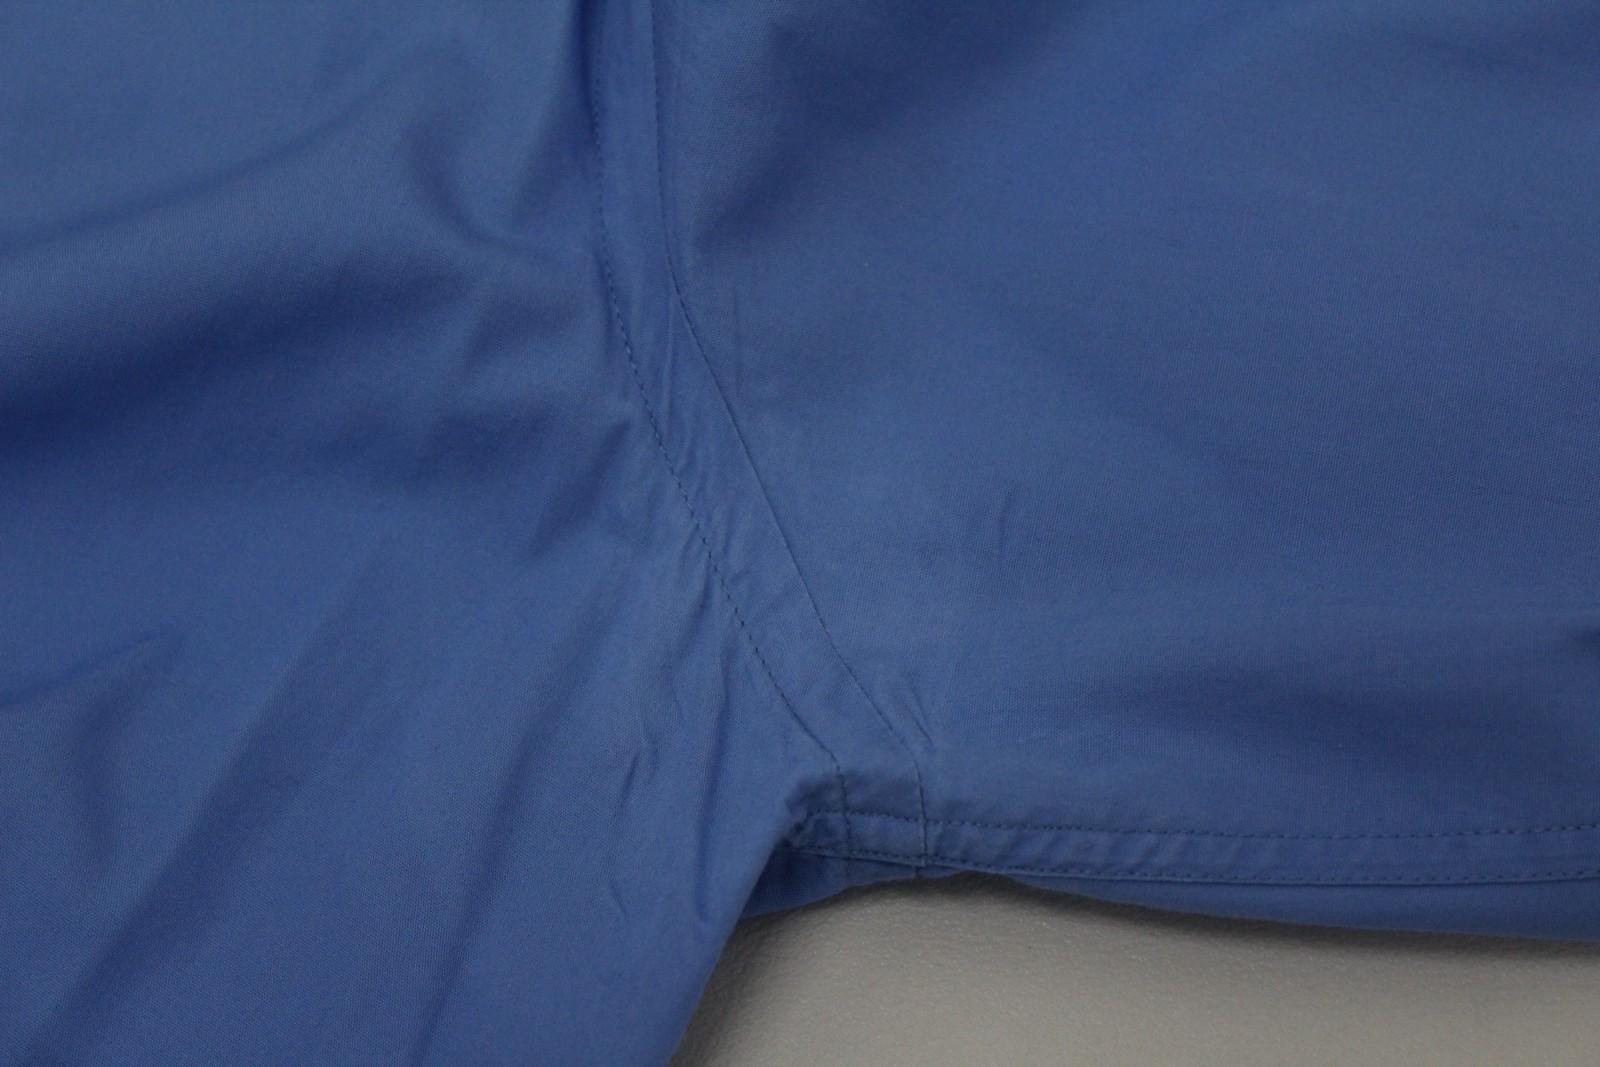 Paul-Smith-Hombres-Azul-Algodon-Mangas-Largas-Camisa-De-Puno-Doble-Cuello-16-5-034-42cm miniatura 8